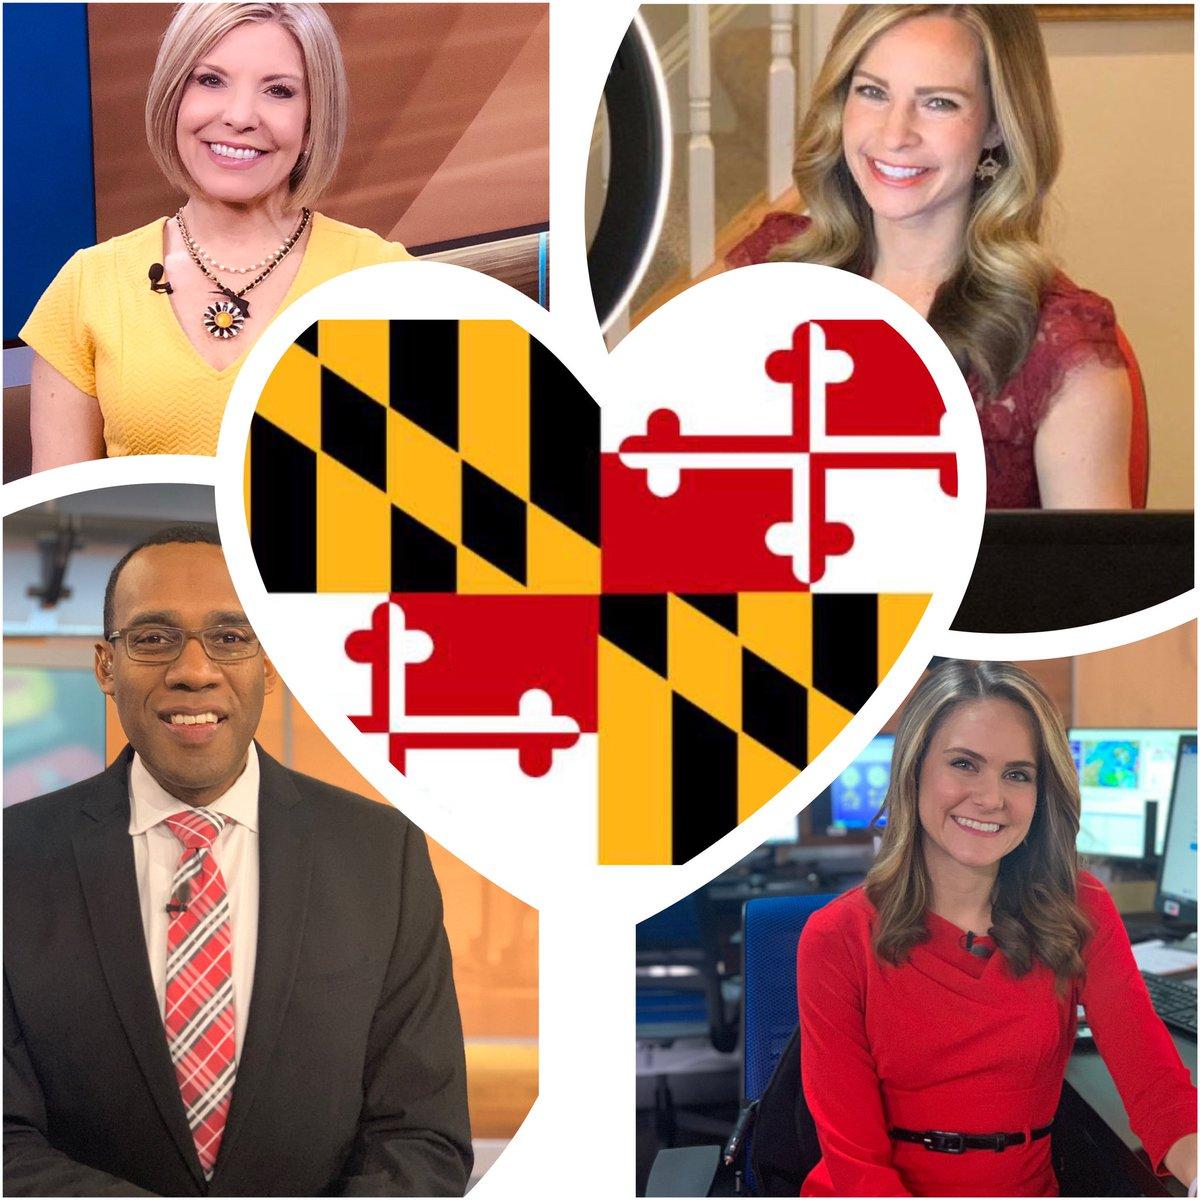 @MindyWbal's photo on #MarylandDay